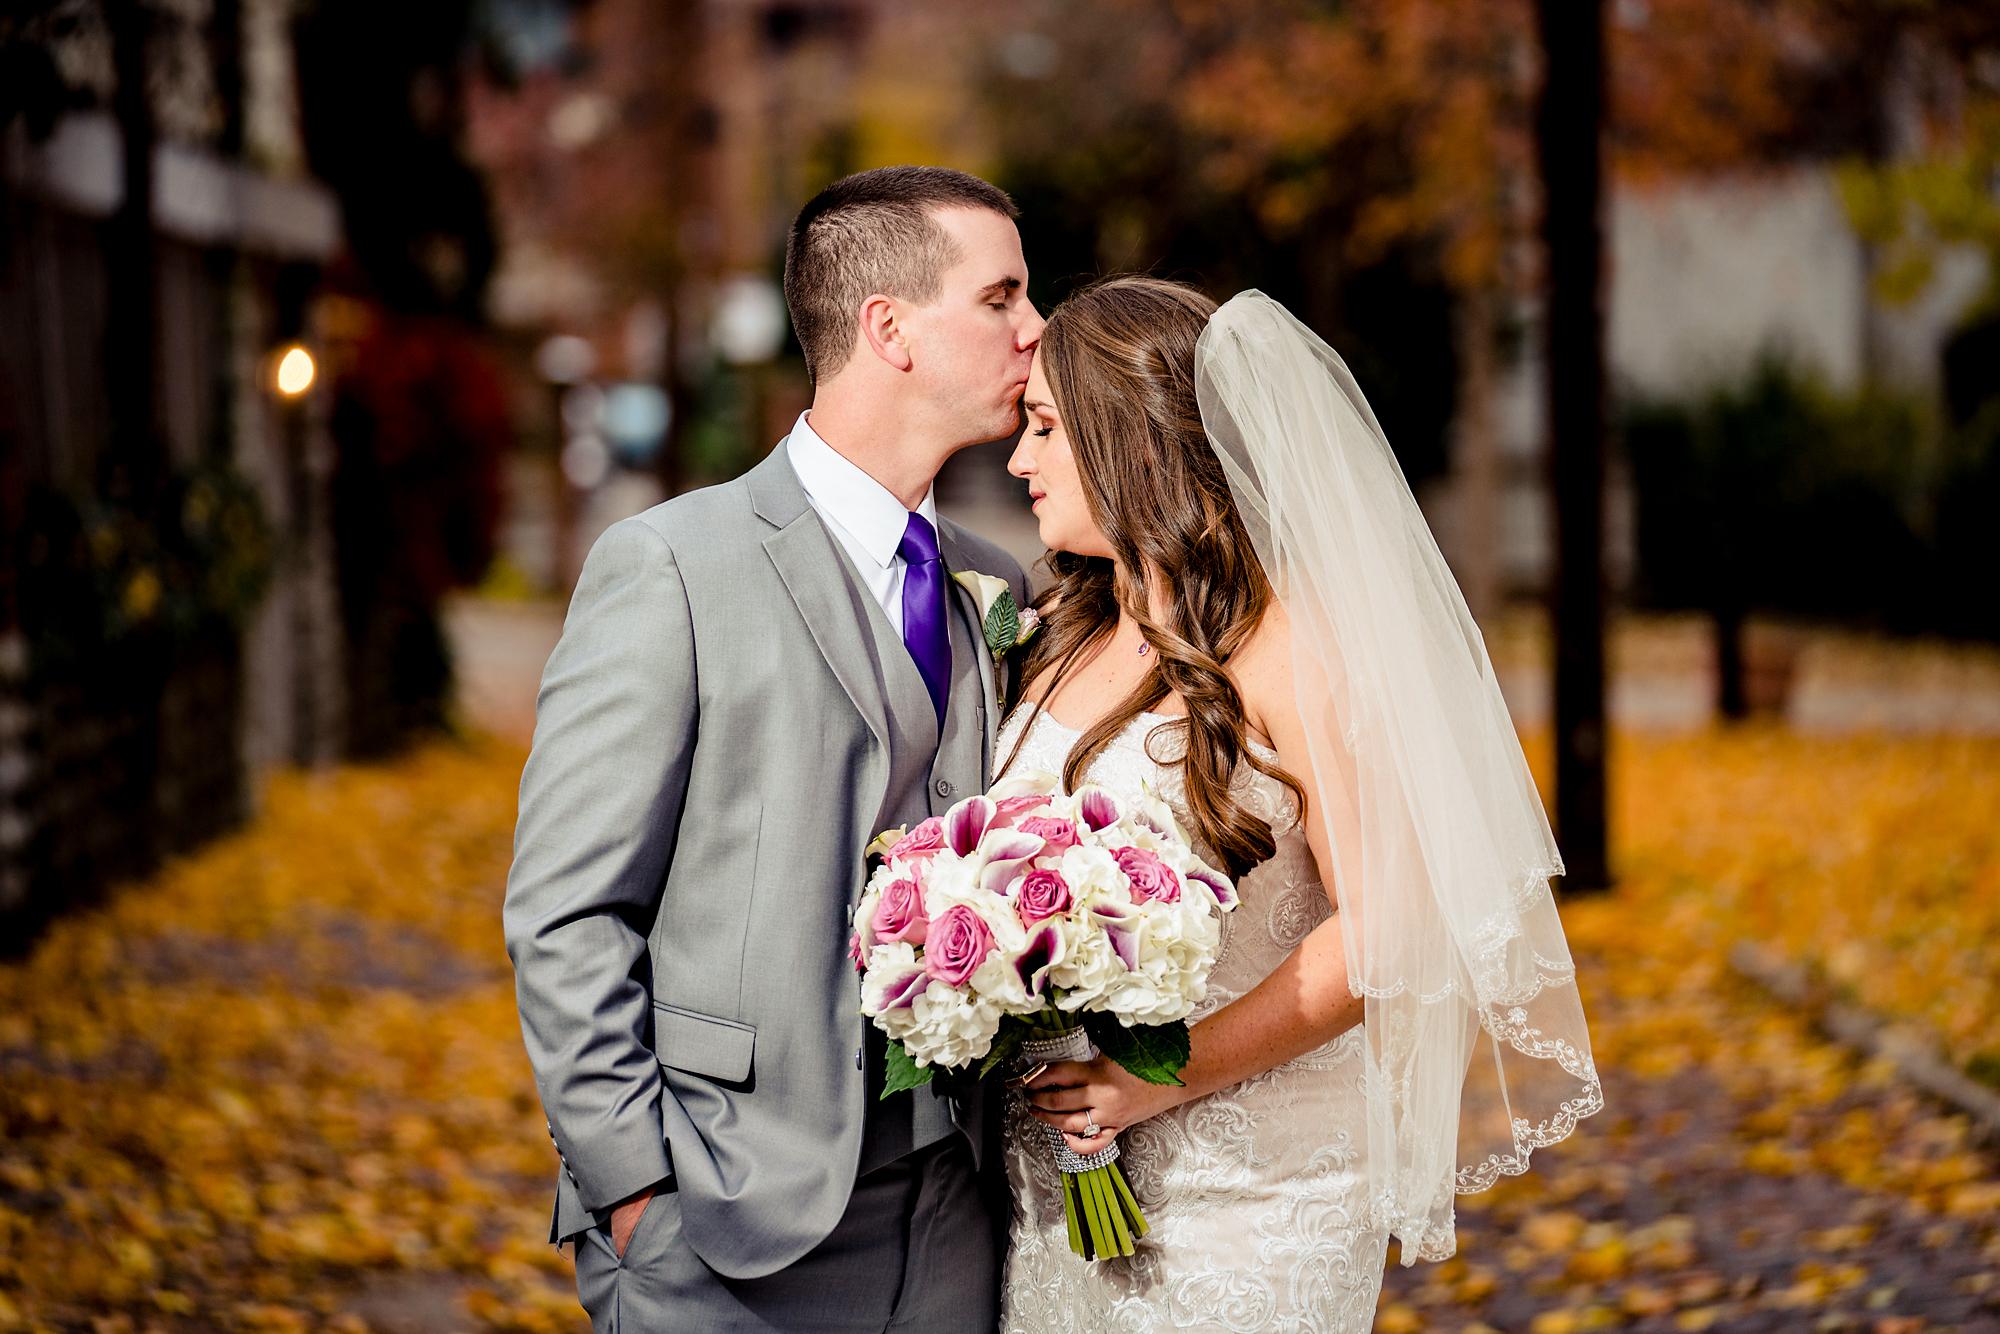 The-Pinnacle-Ballroom-Covington-KY-Wedding-Photography-7.jpg